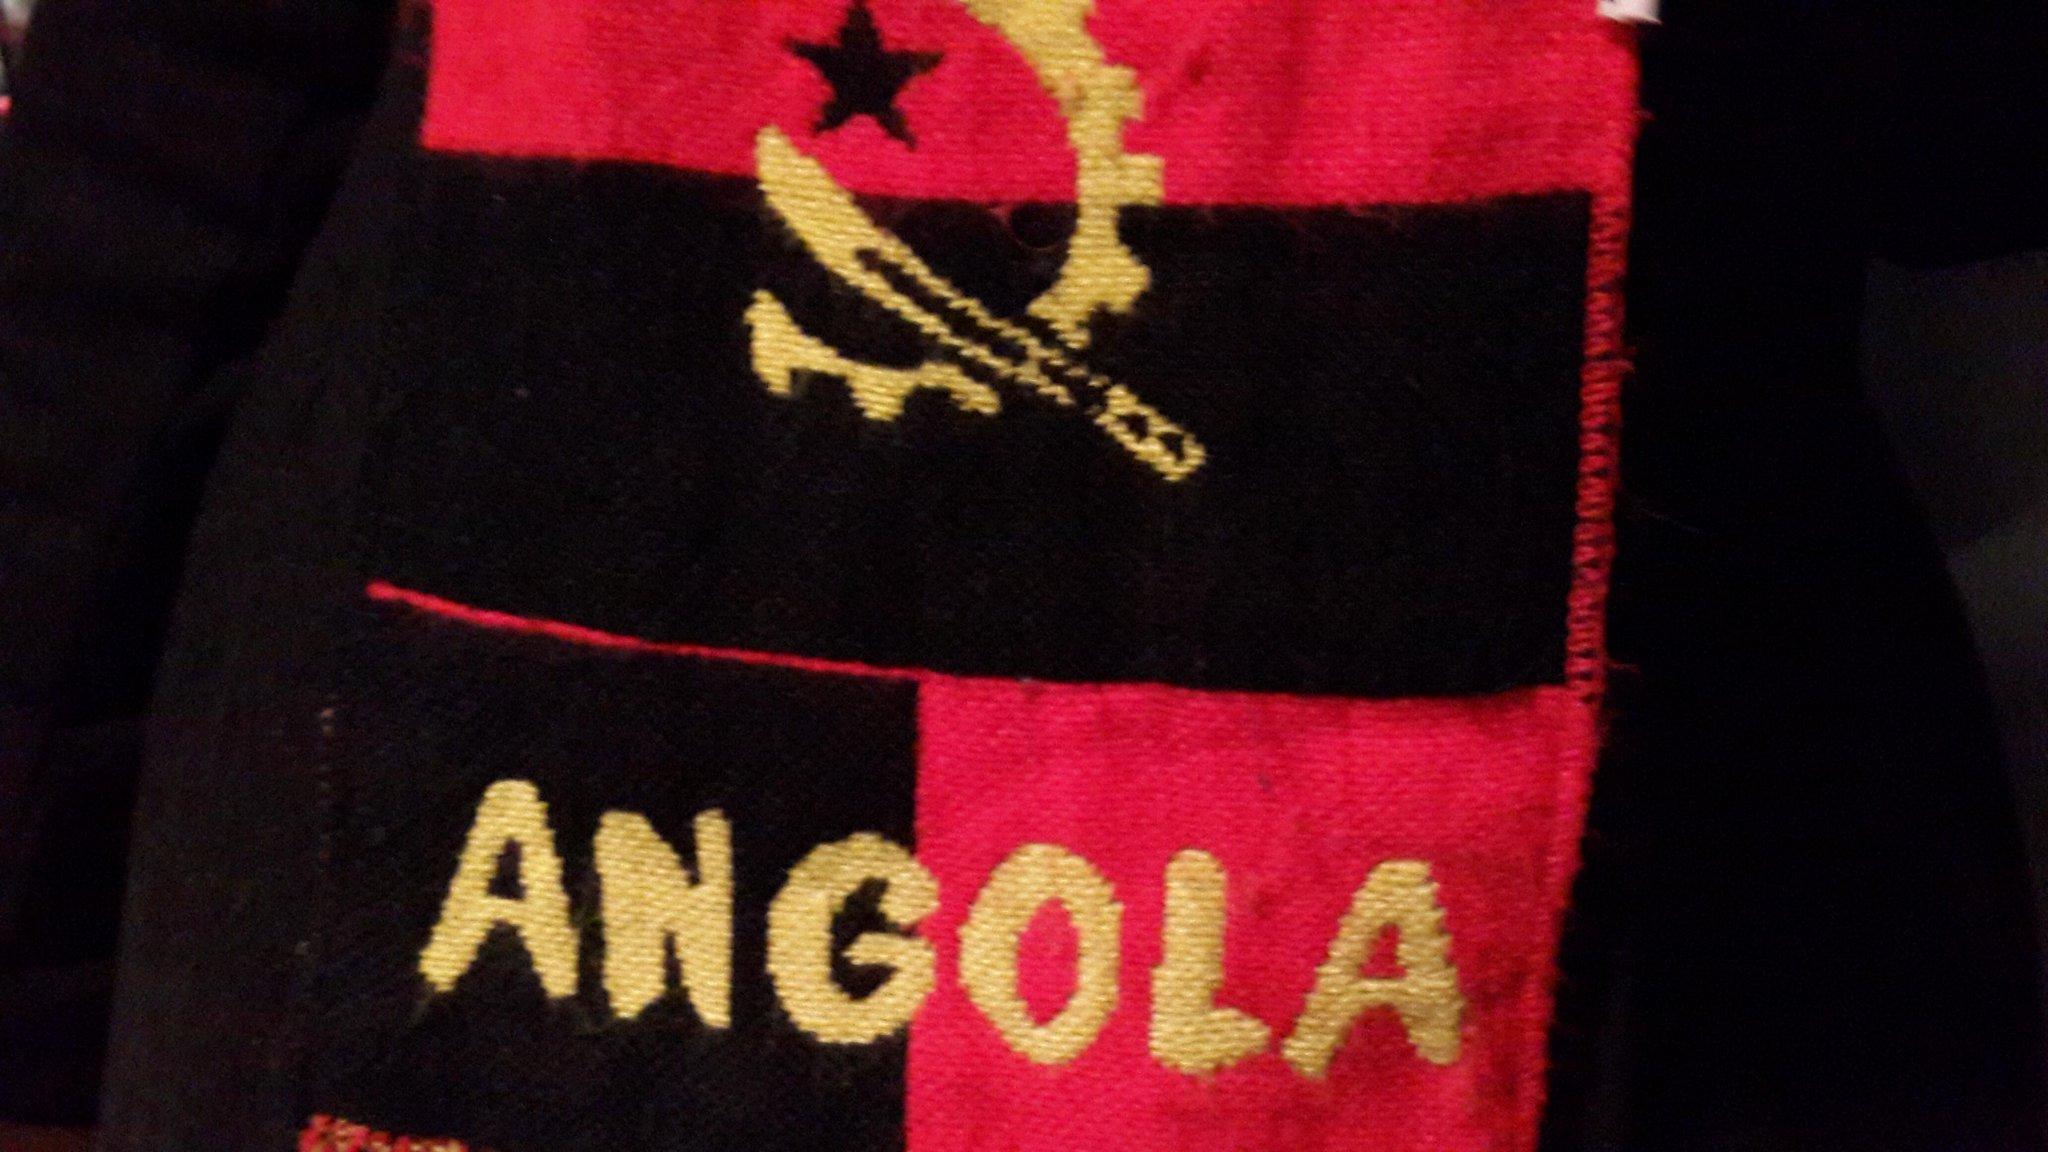 @Taniuzka84: #3starAfrica #angola #tania#@jofila7 representing http://t.co/RhZnyeEQl0